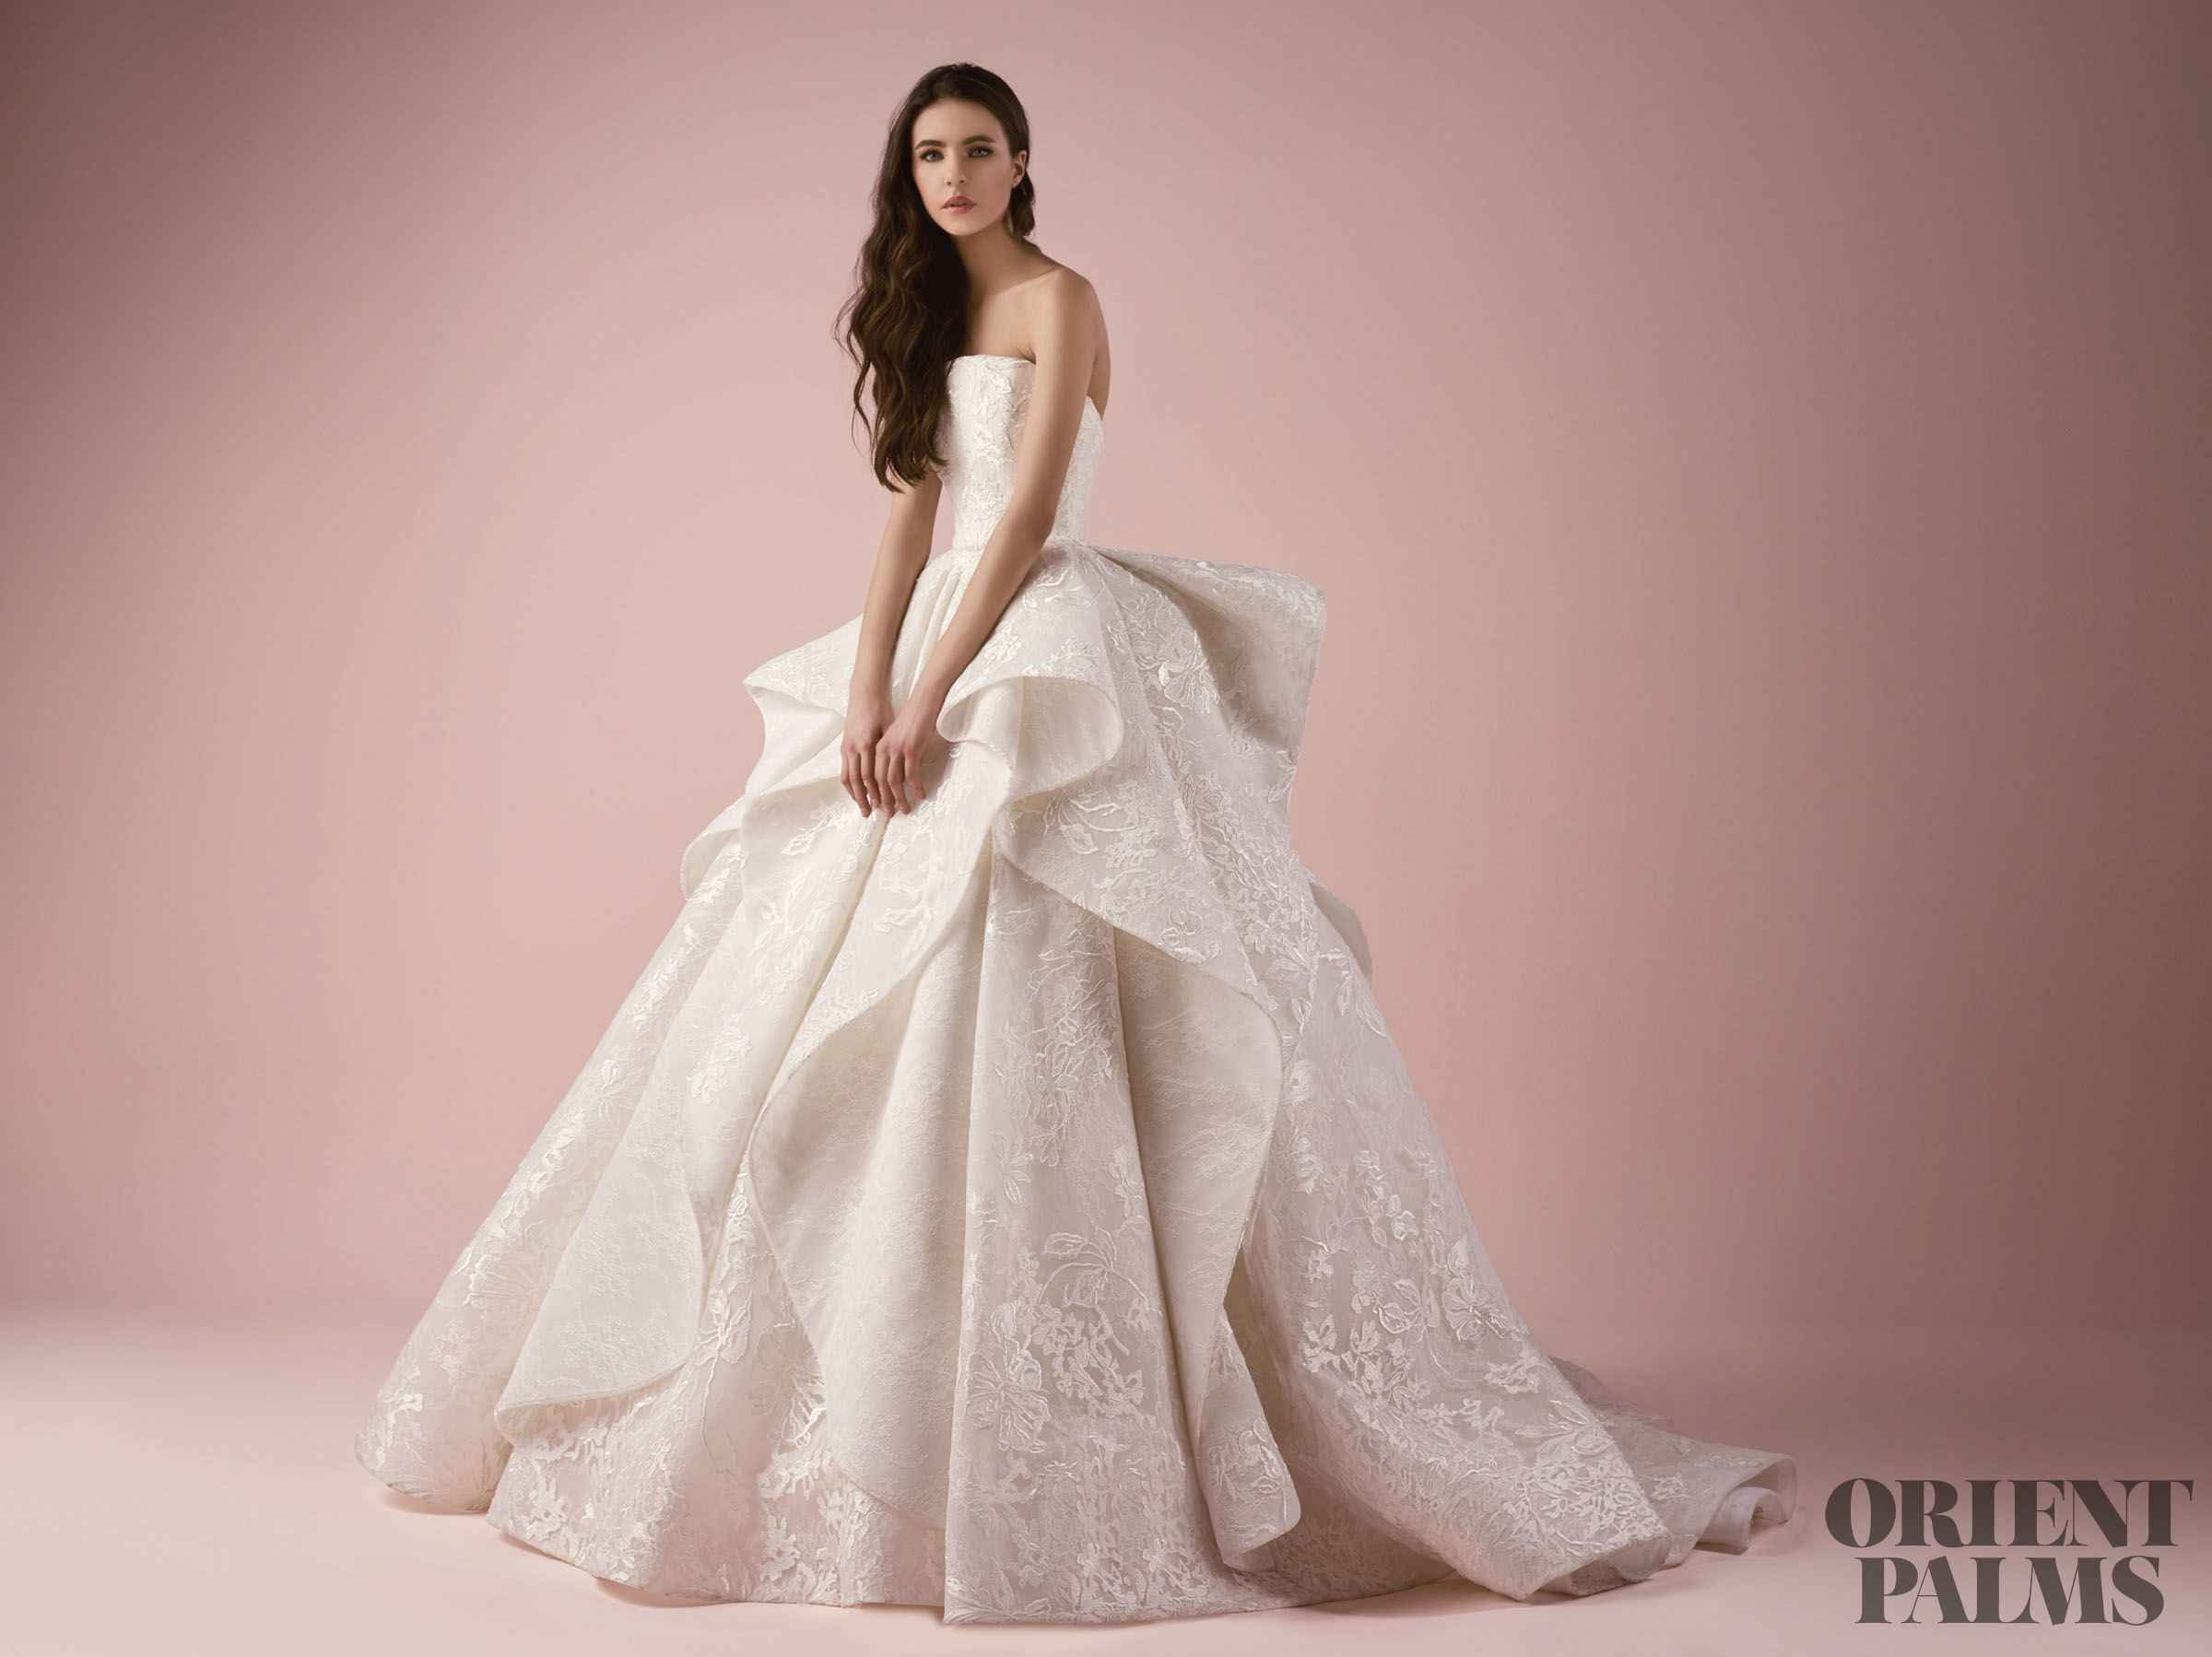 Saiid Kobeisy 2018 collection - Bridal